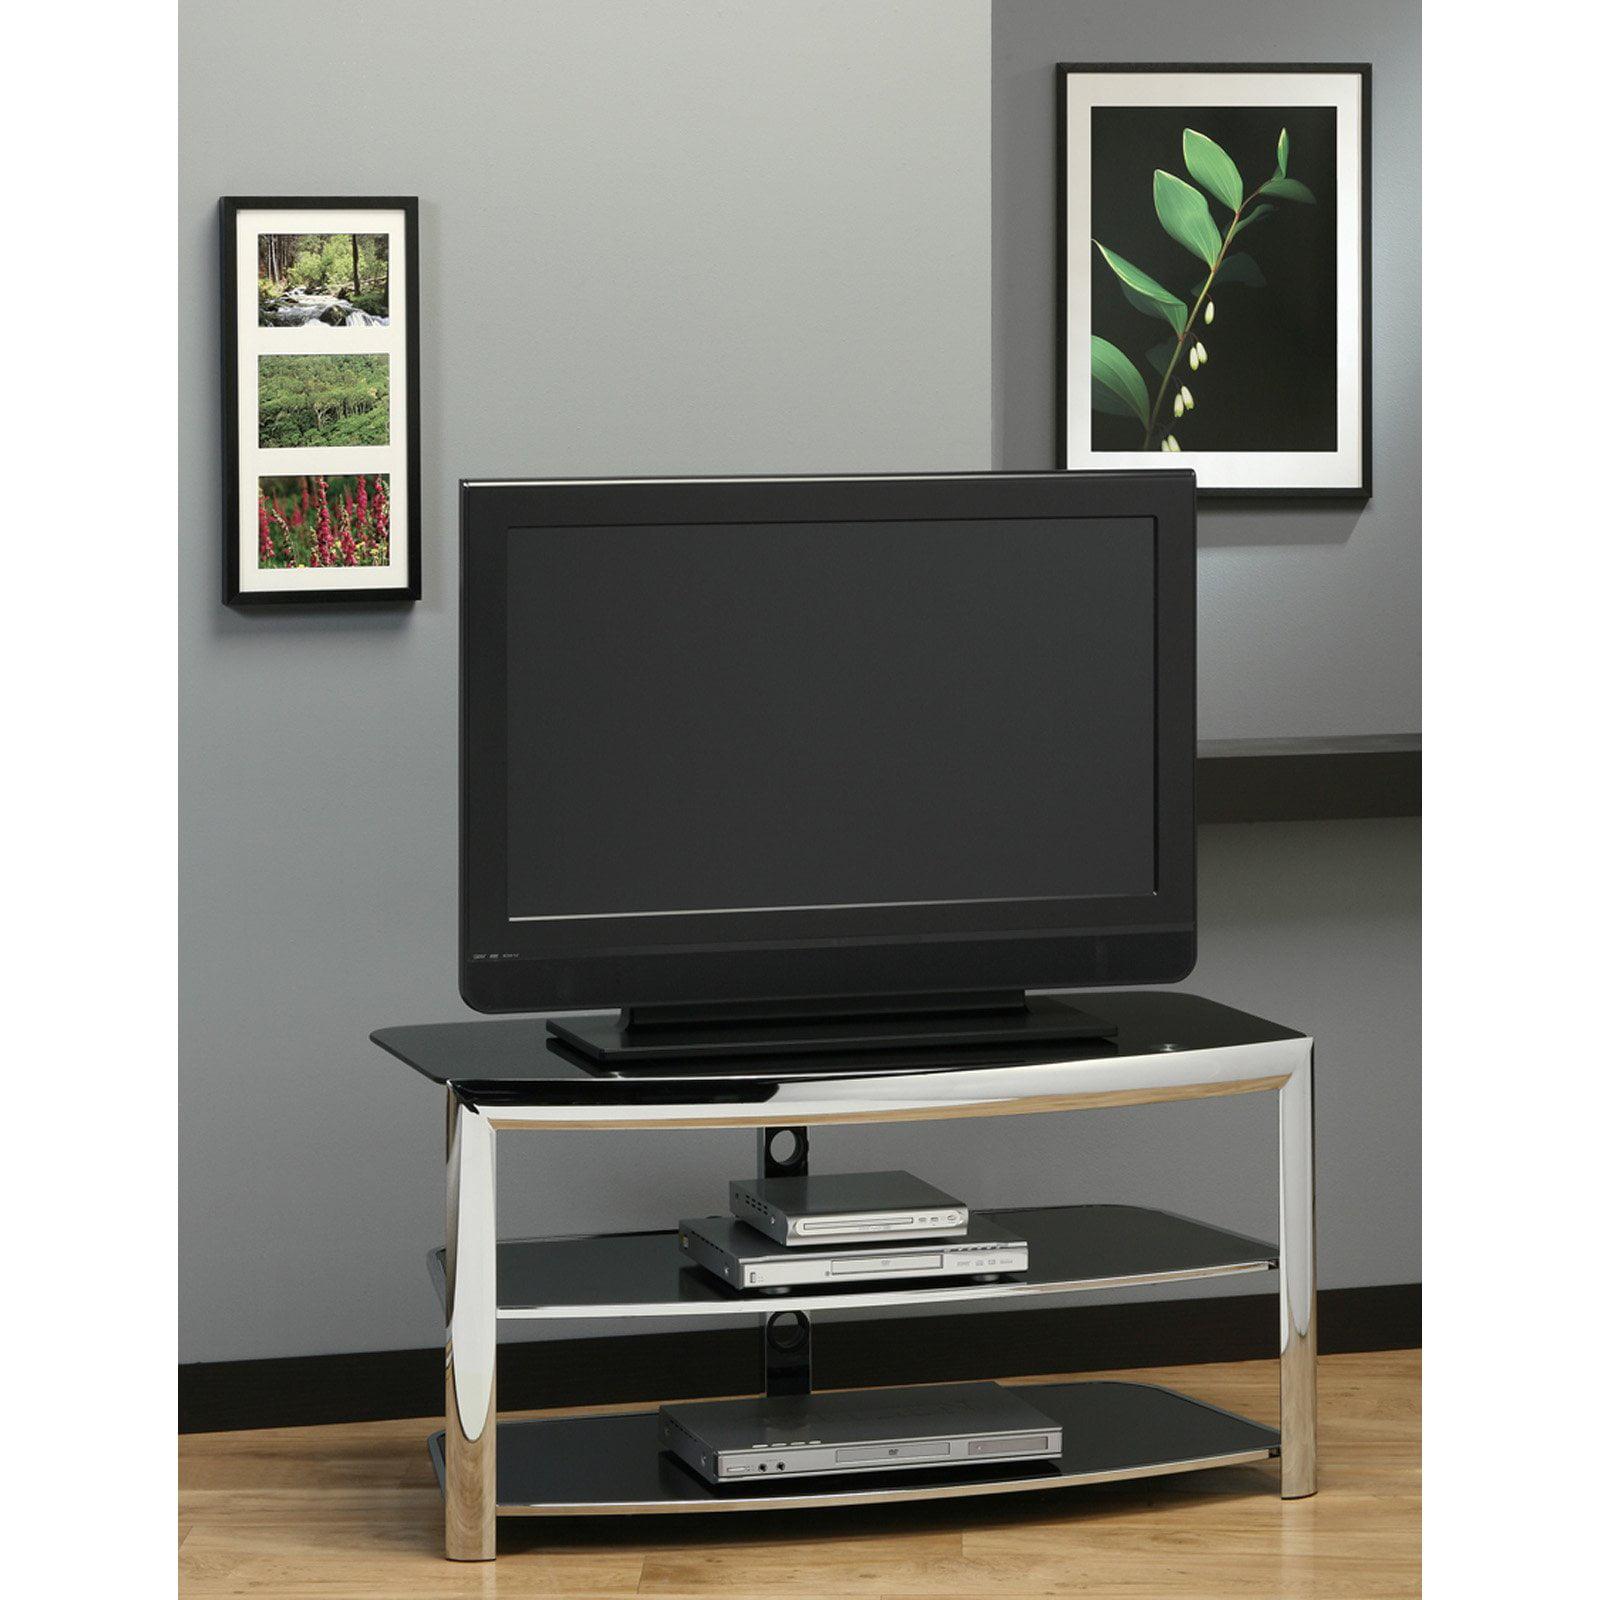 Monarch Specialties 3 Tier TV Stand